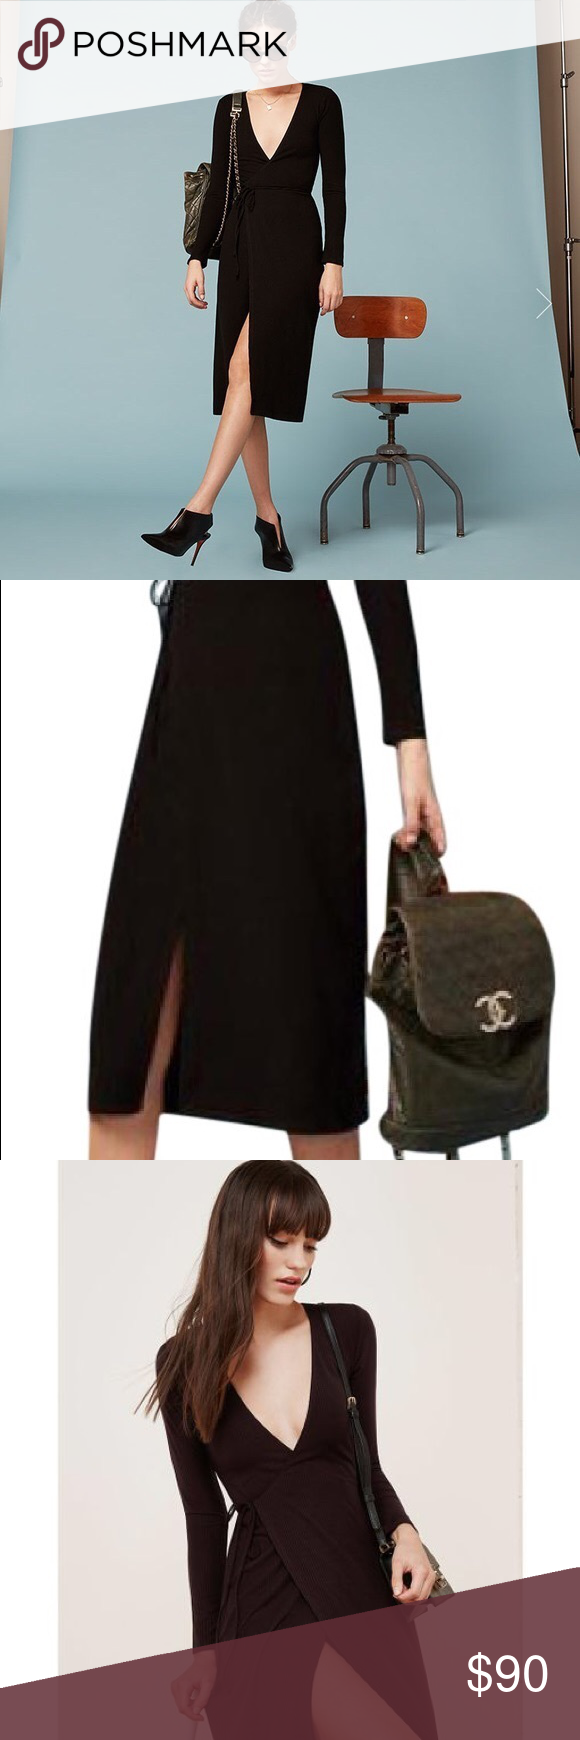 57378c0b79e Reformation Cyan Wrap Dress Black Stretchy